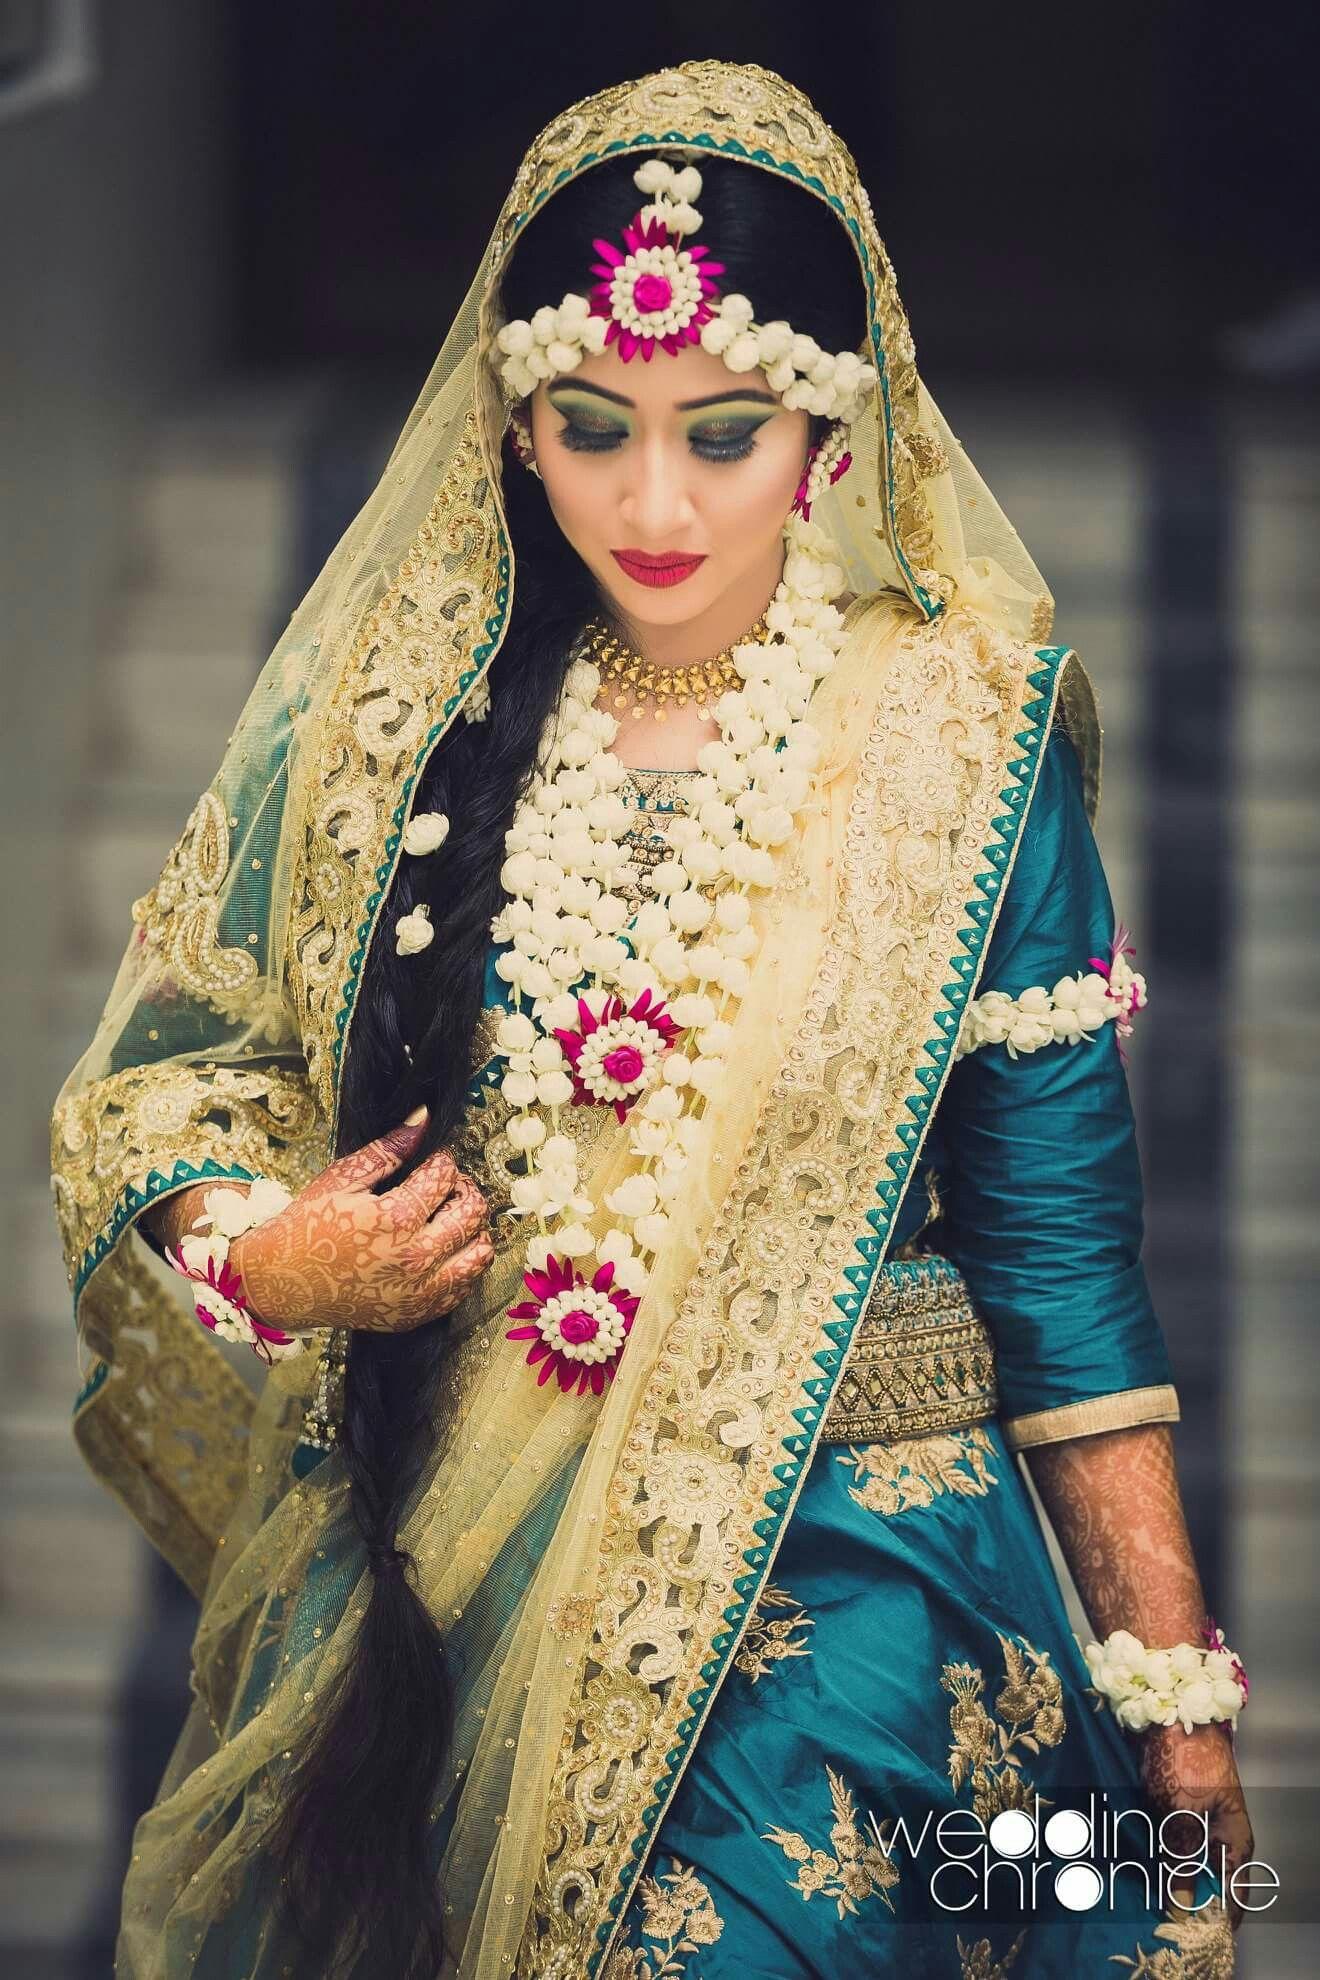 Bangladeshi Bride image by Nurjahan Akter Bridal